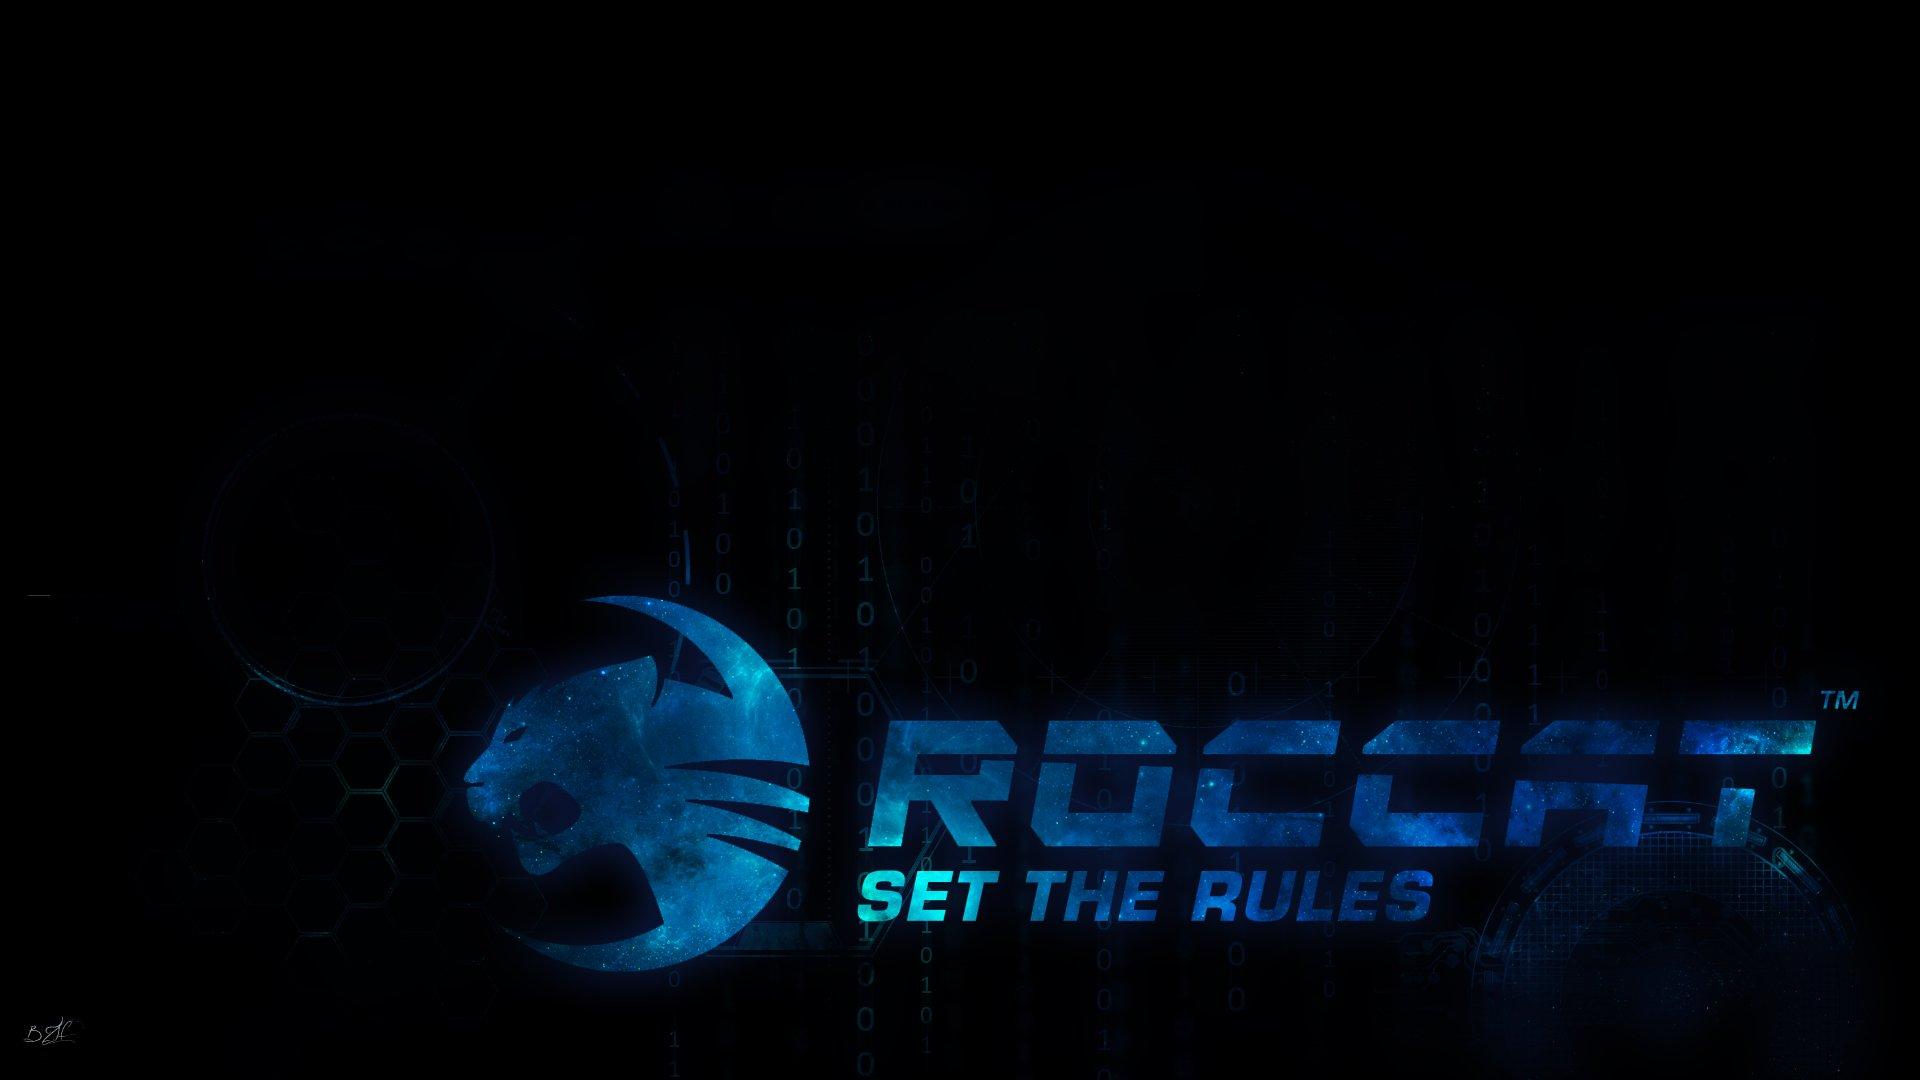 download roccat logo wallpaper - photo #4